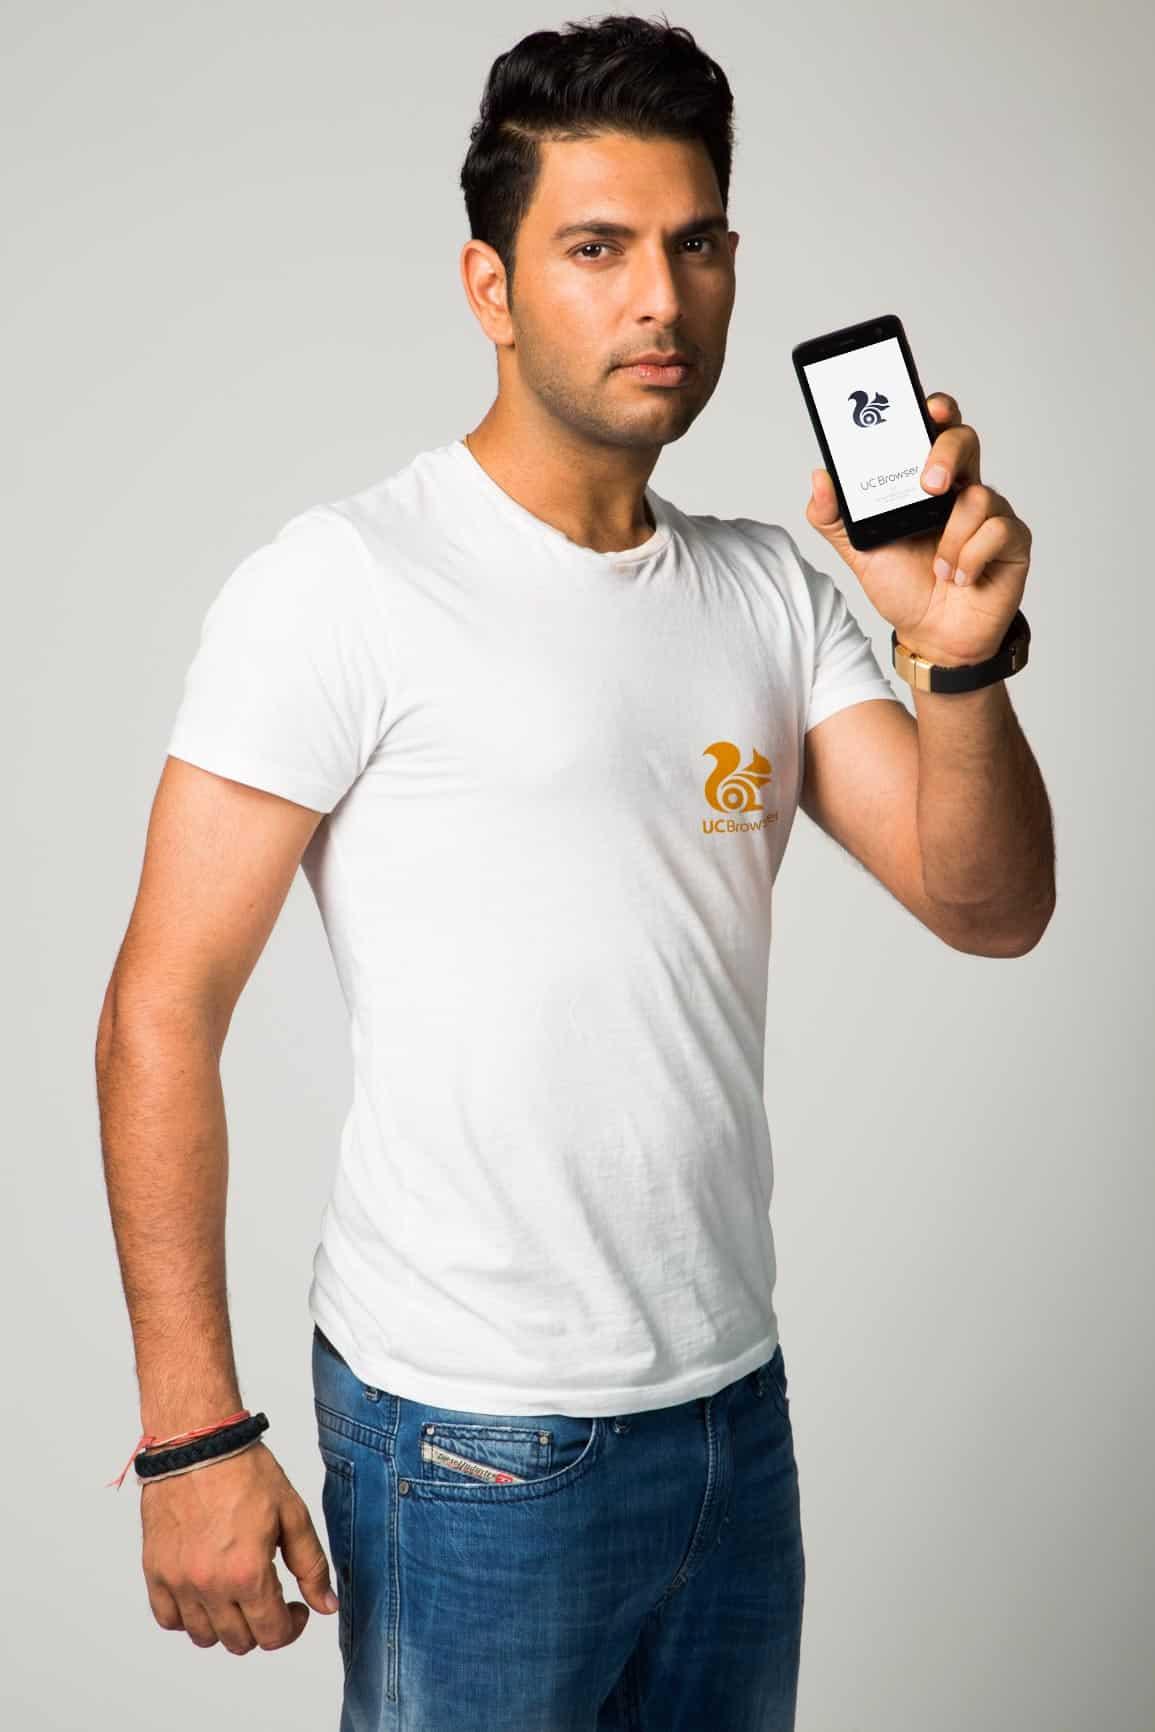 UC Browser appoints Yuvraj Singh as Brand Ambassador ...